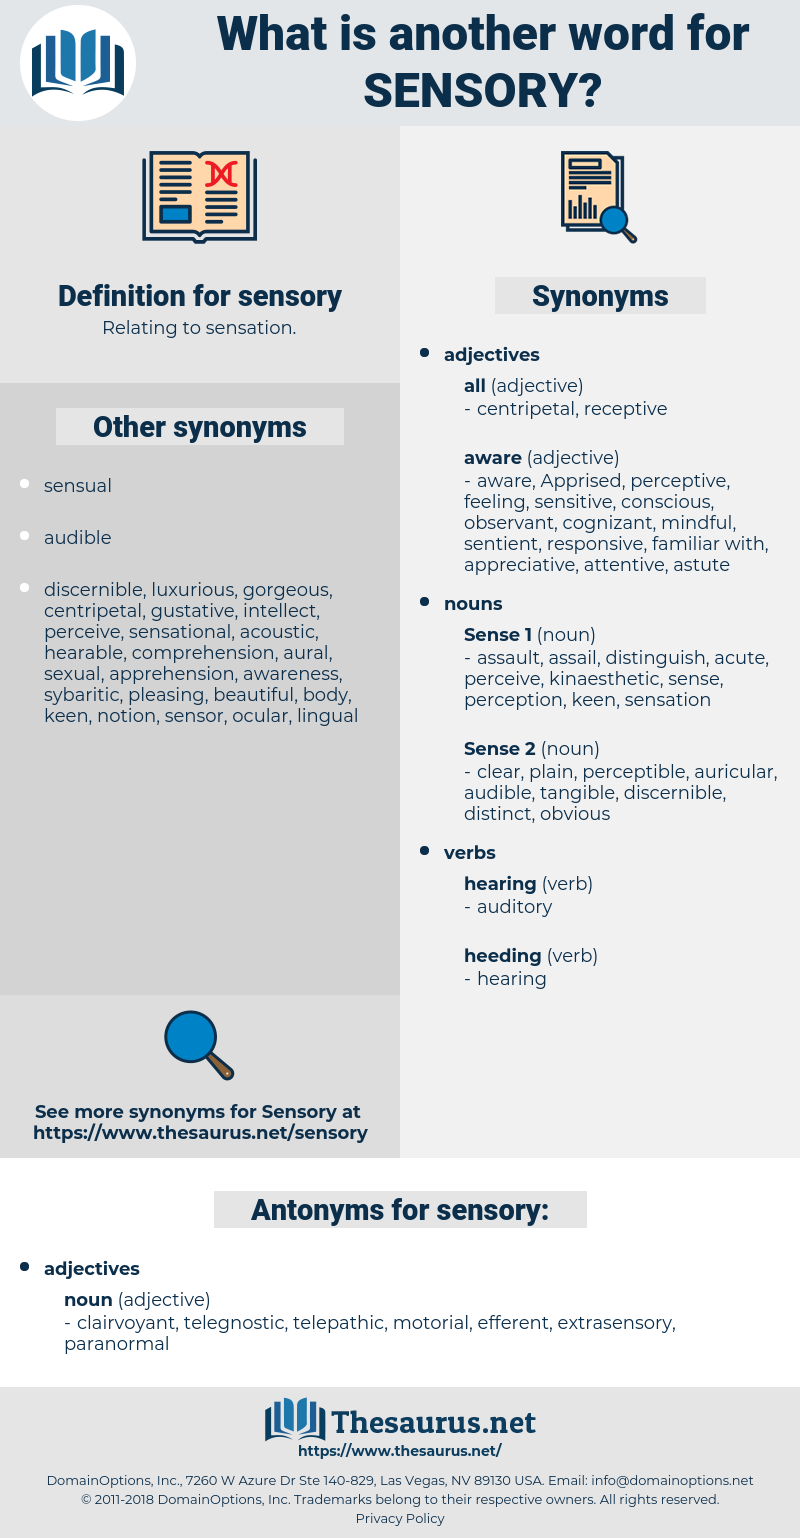 Synonyms For Sensory Antonyms For Sensory Thesaurus Net